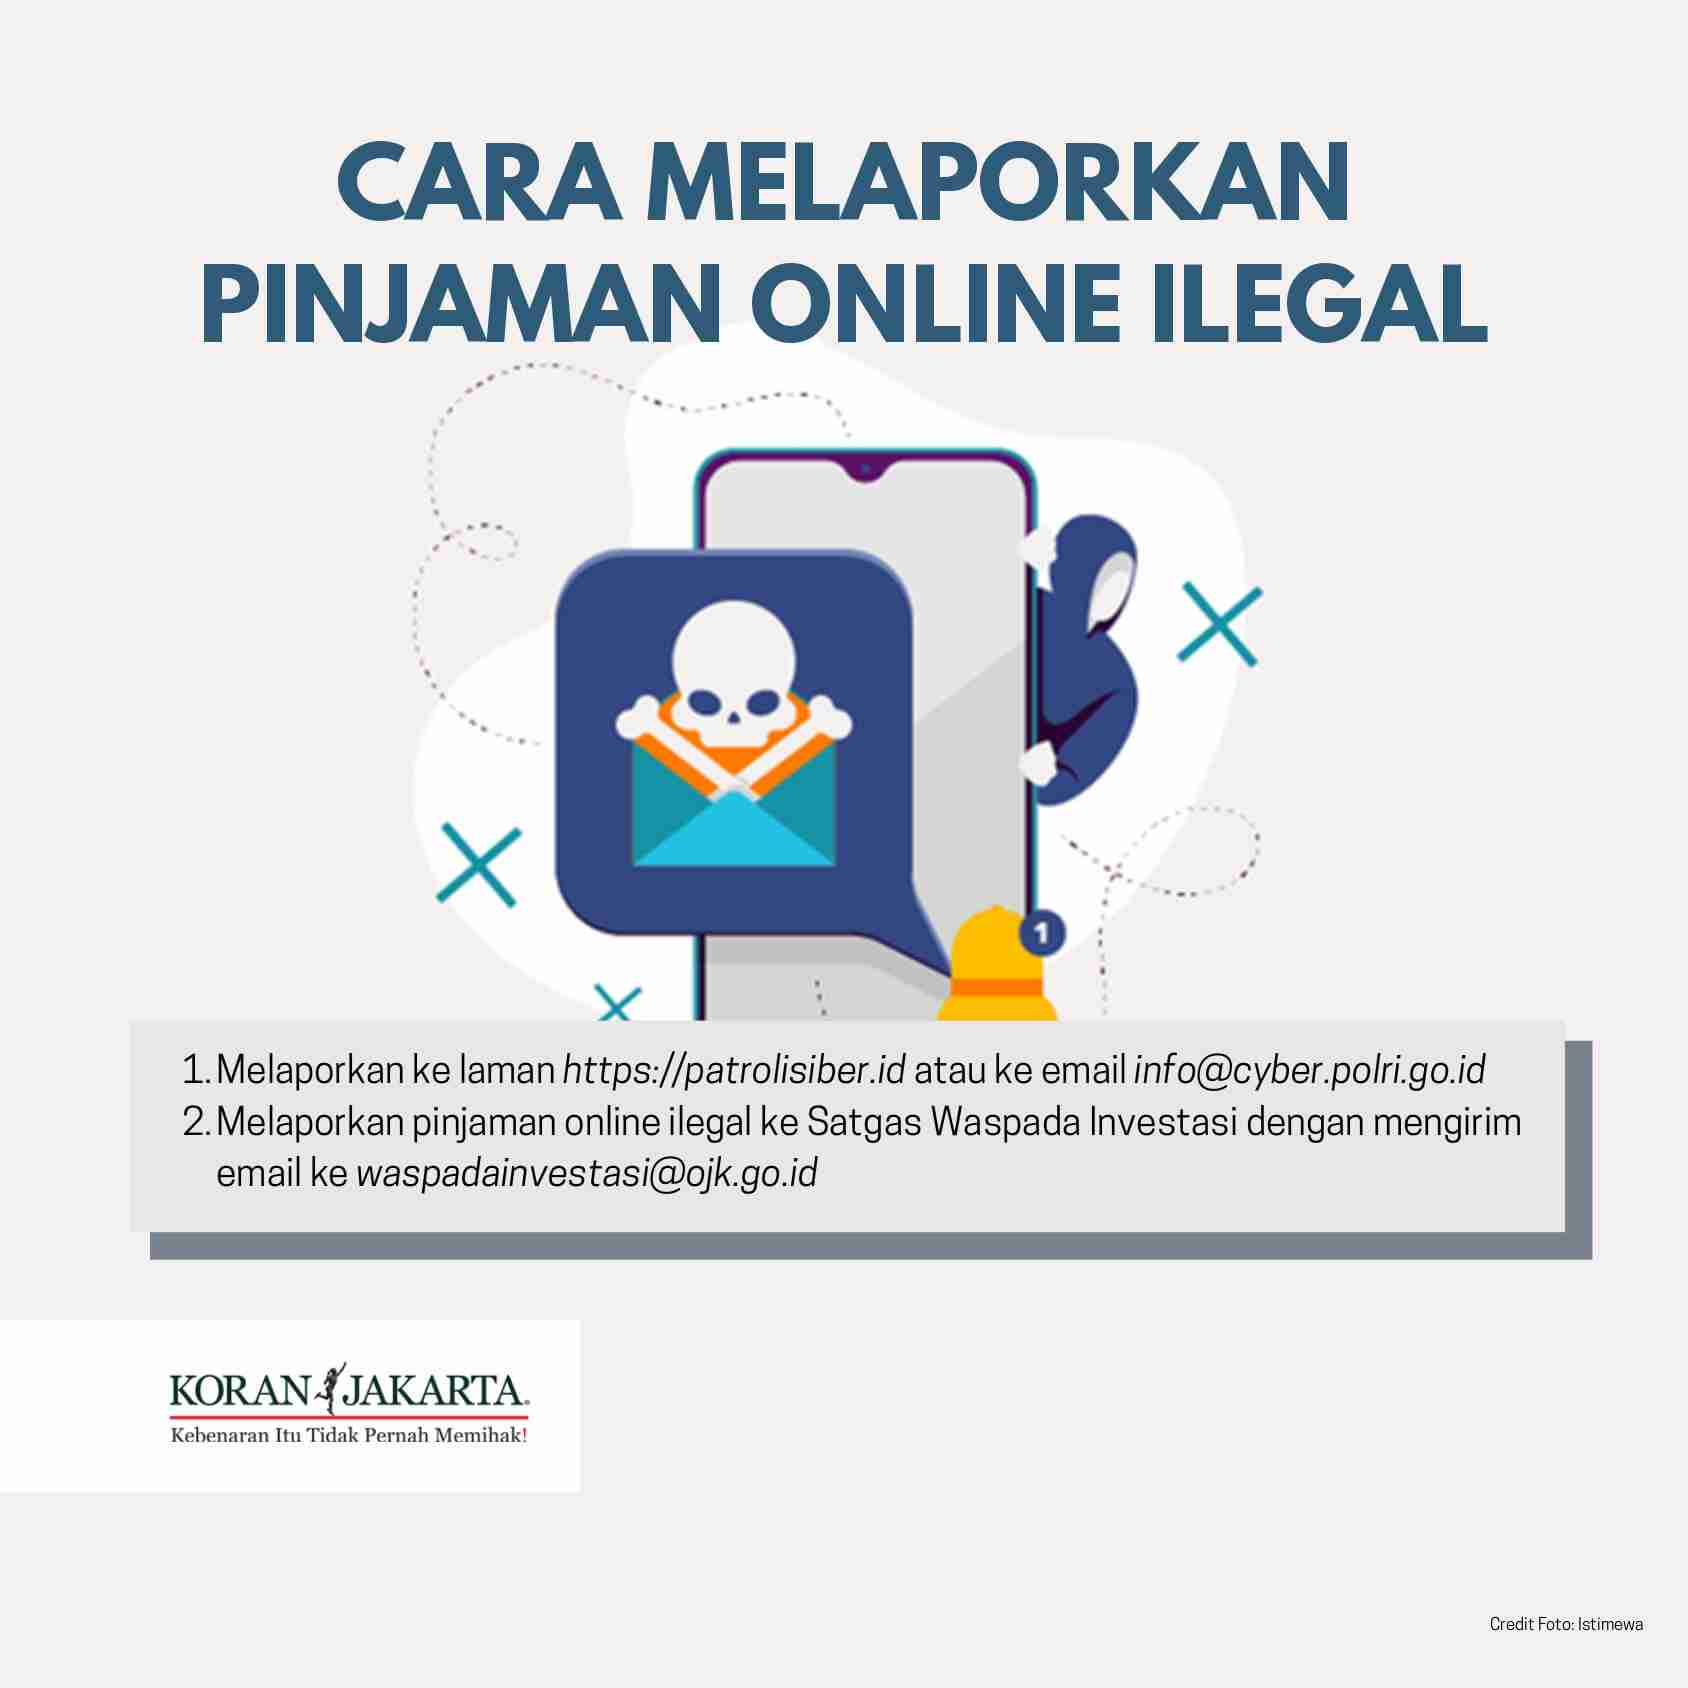 Pinjaman Online Ilegal 6